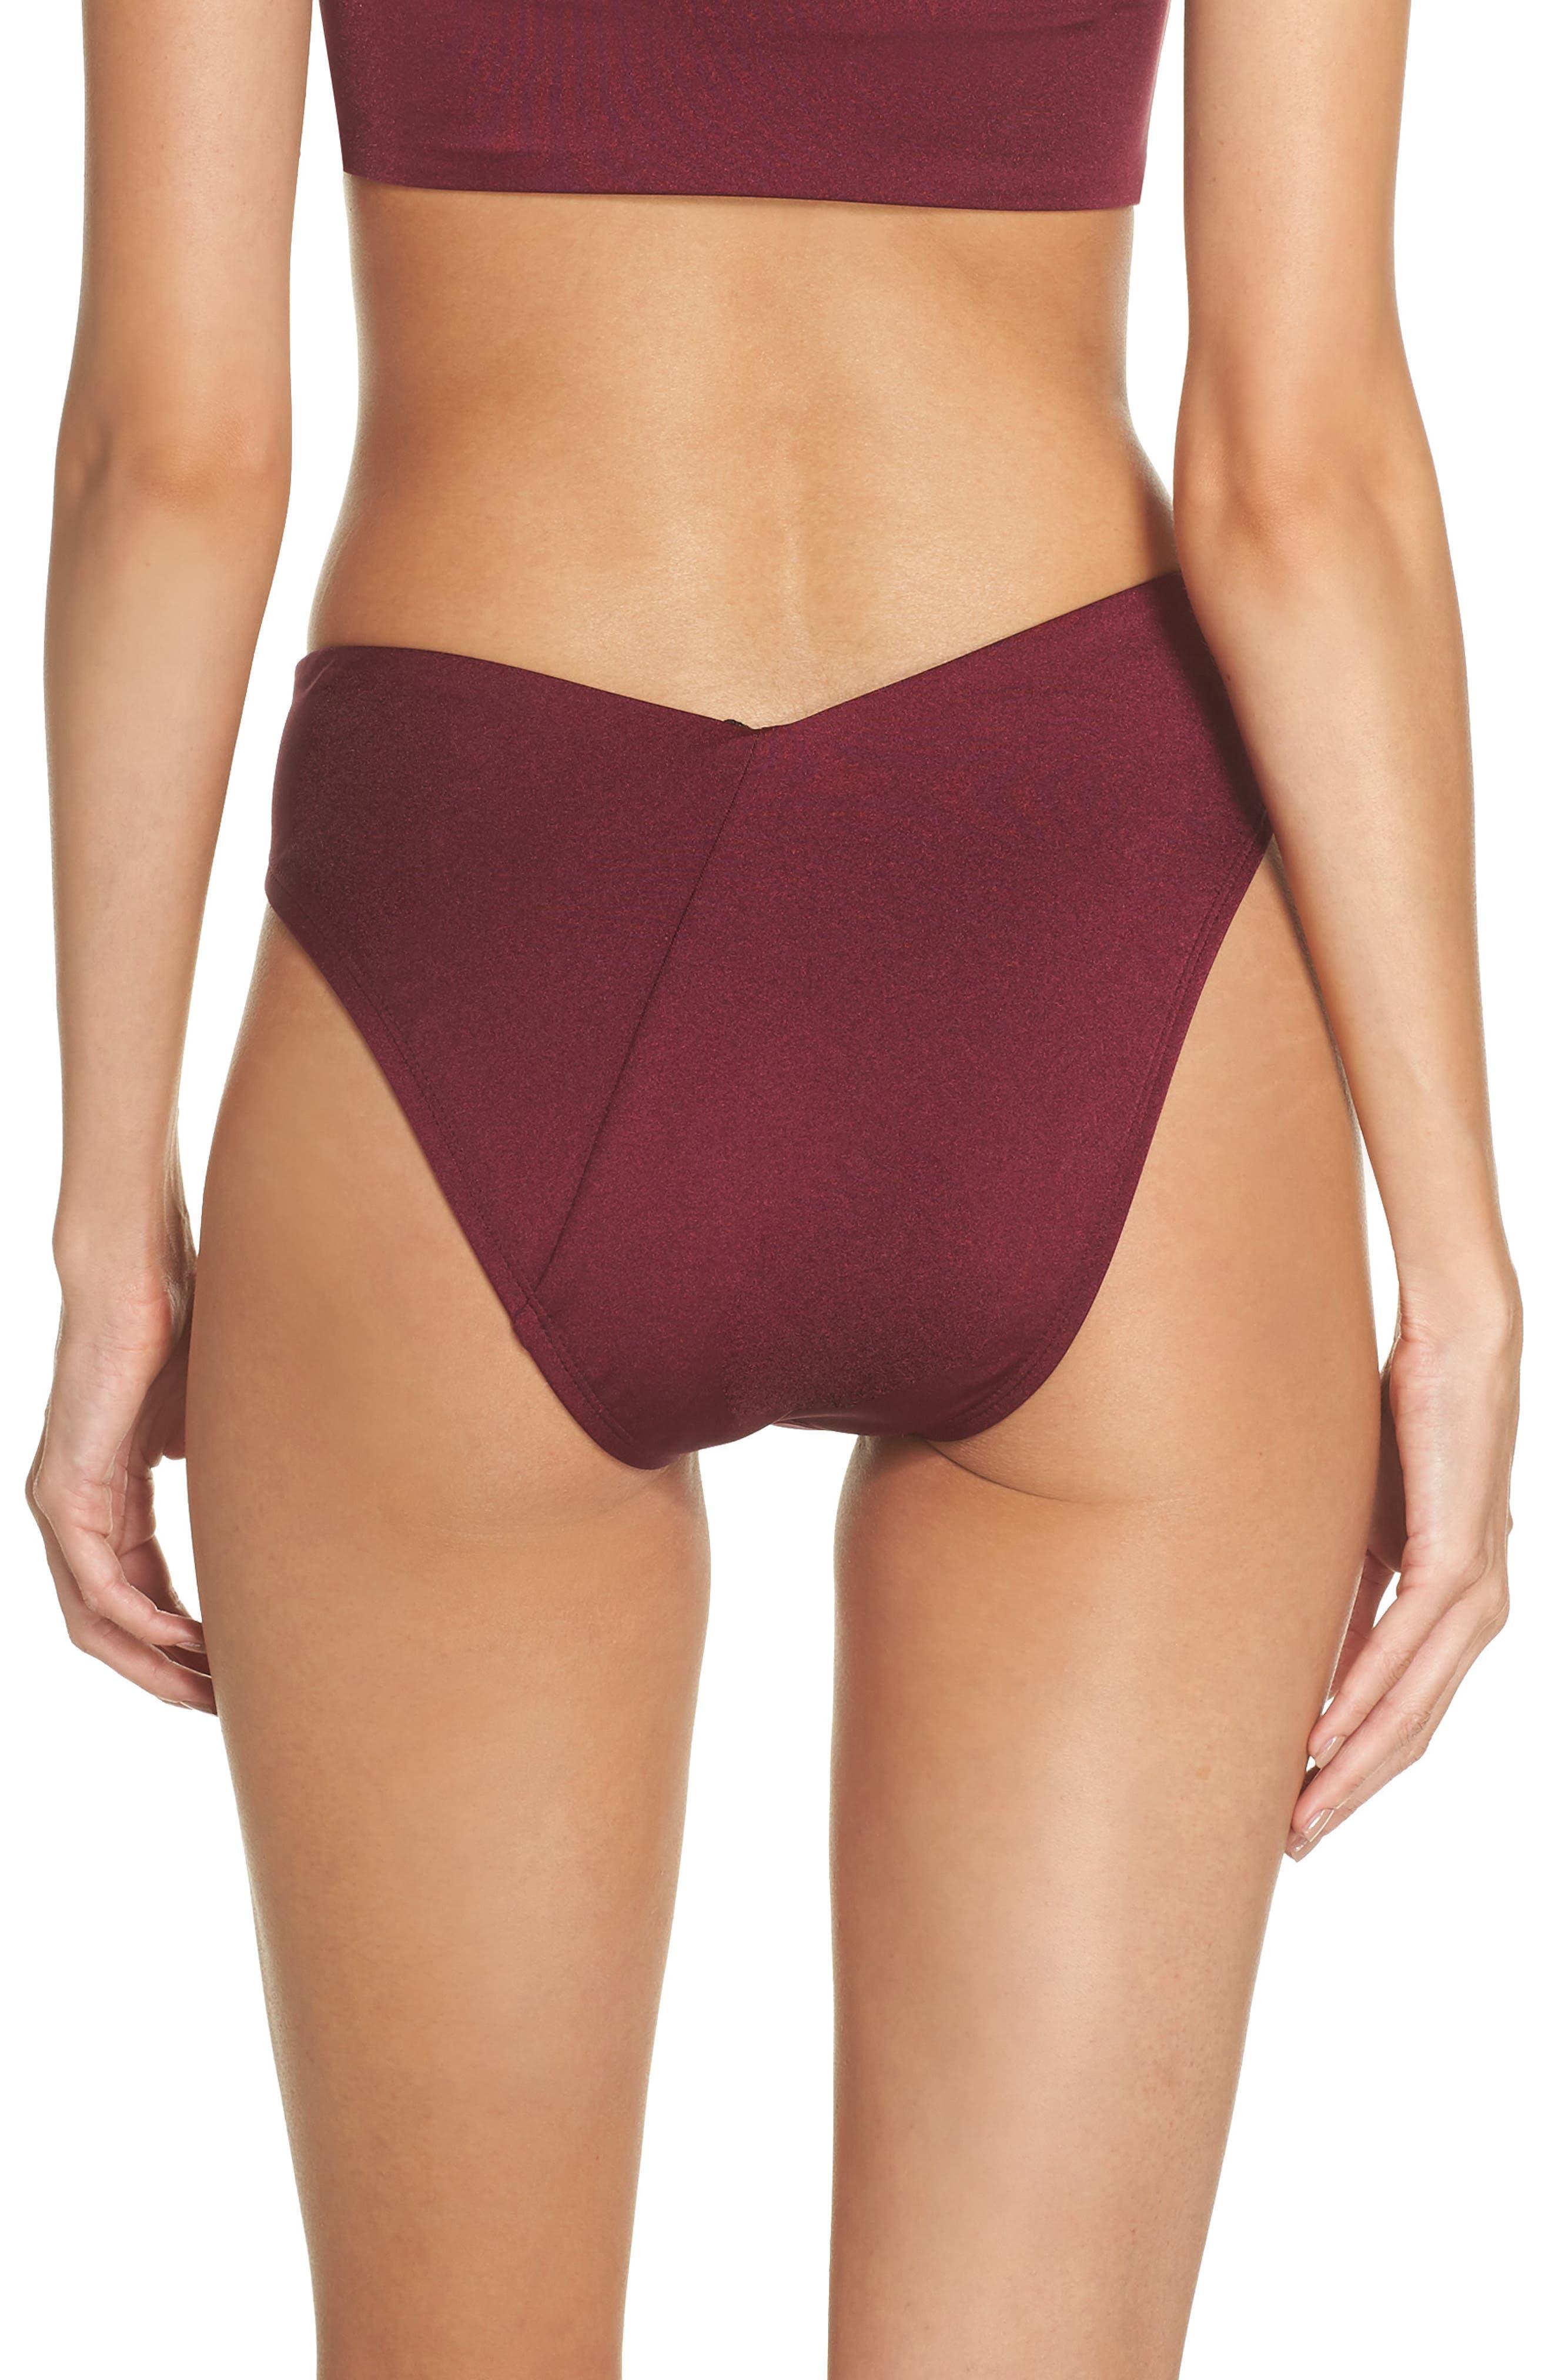 Riviera High Waist Bikini Bottoms,                             Alternate thumbnail 2, color,                             BURGUNDY FIELD